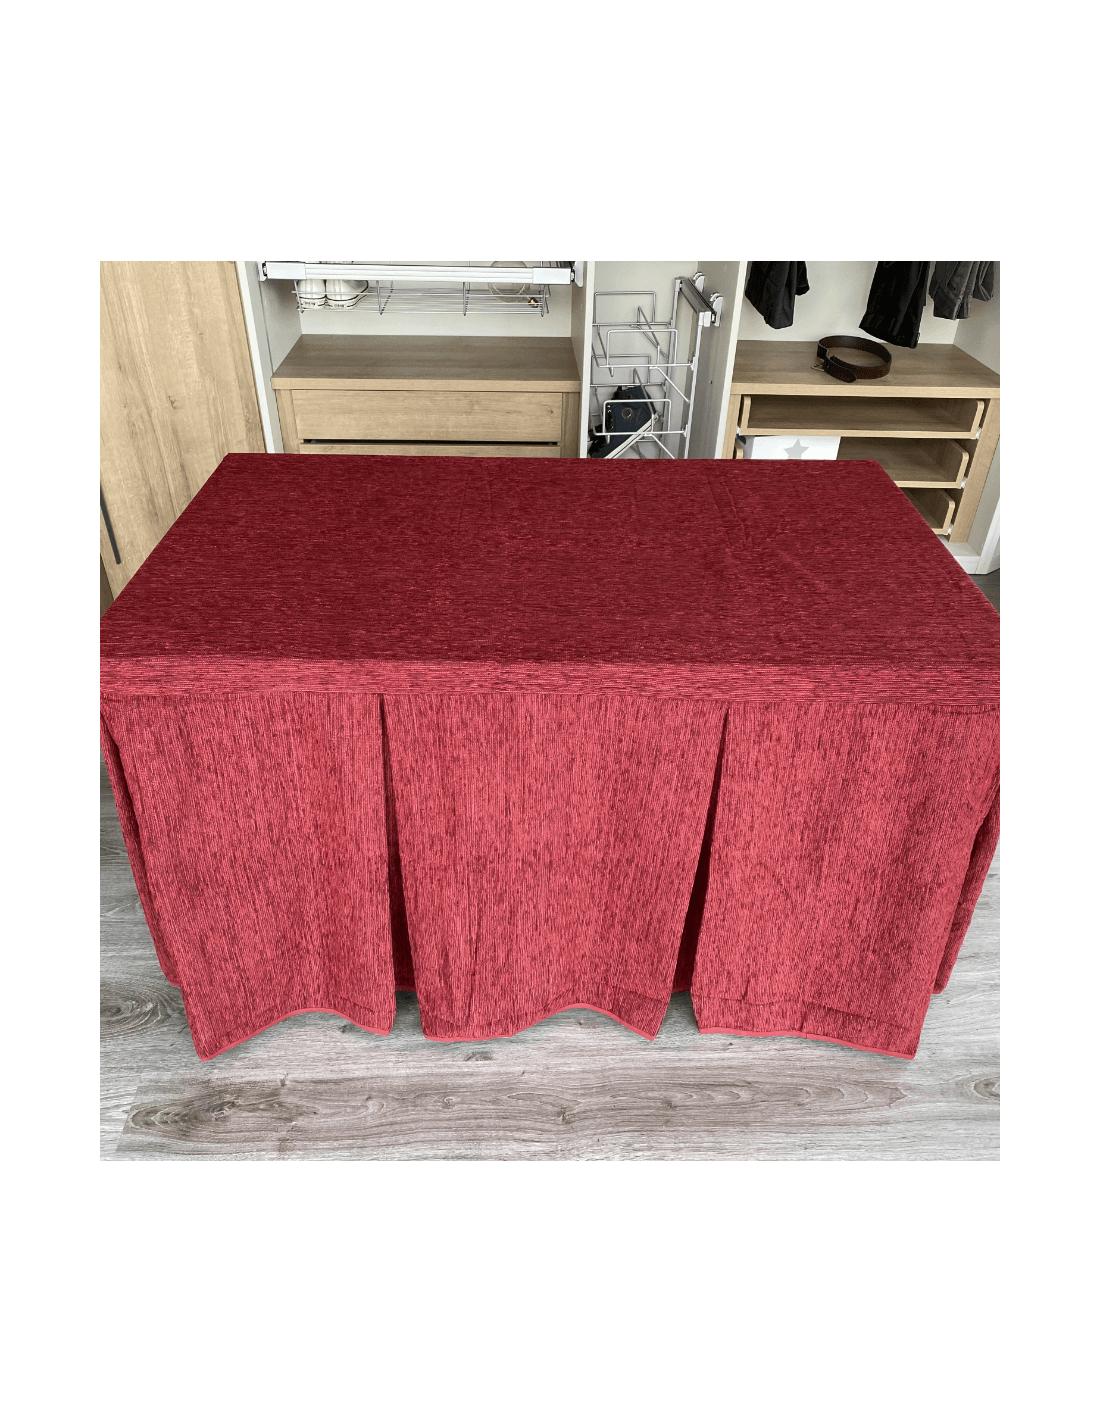 mesa de comedor de madera extensible con cristales decorativos moderna